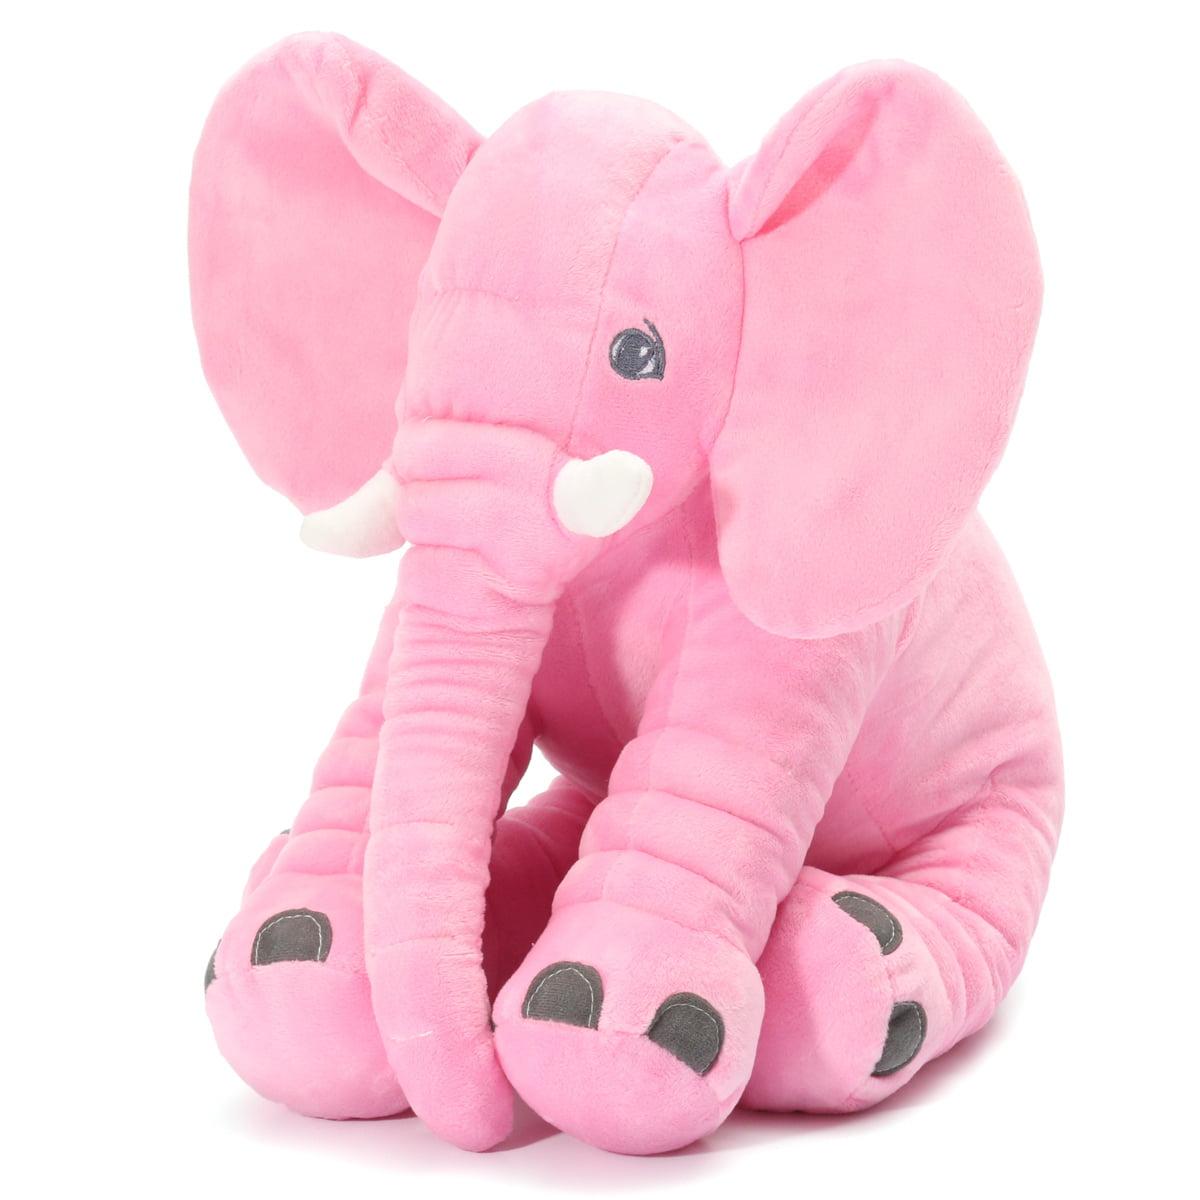 Elephant Doll Pillow Baby Stuff Baby Long Nose Soft Plush Stuff Toys